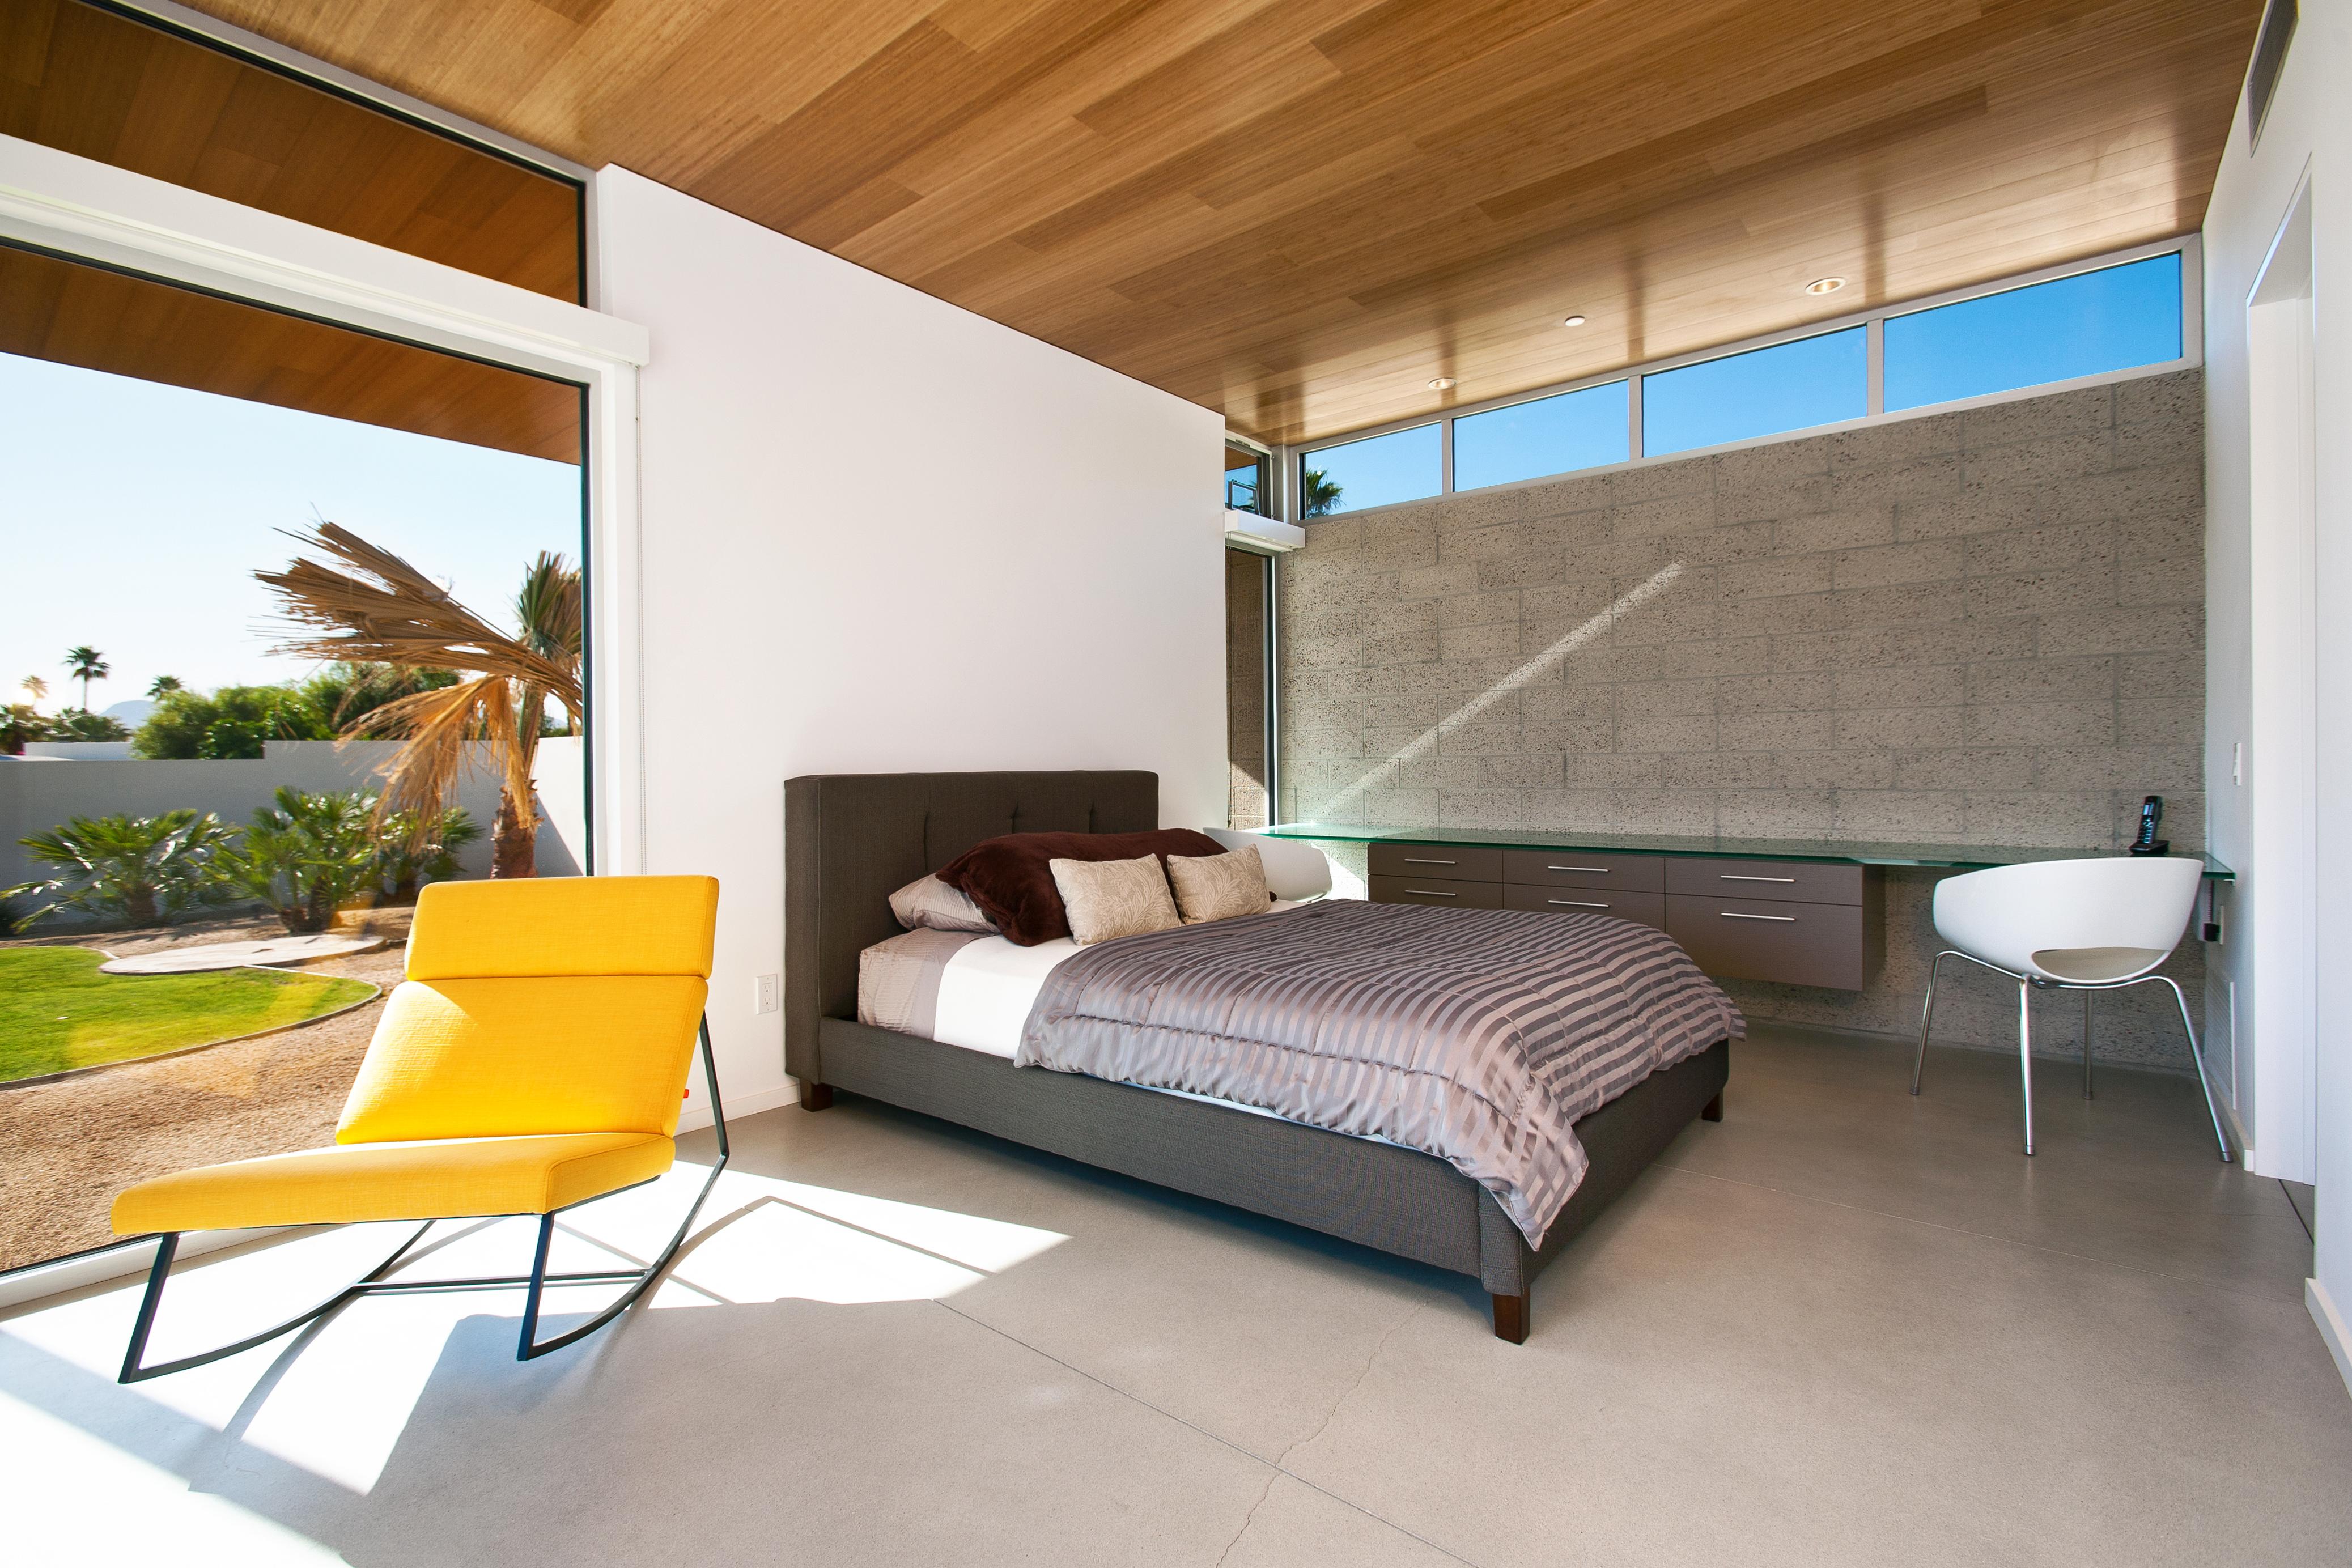 Casita Room